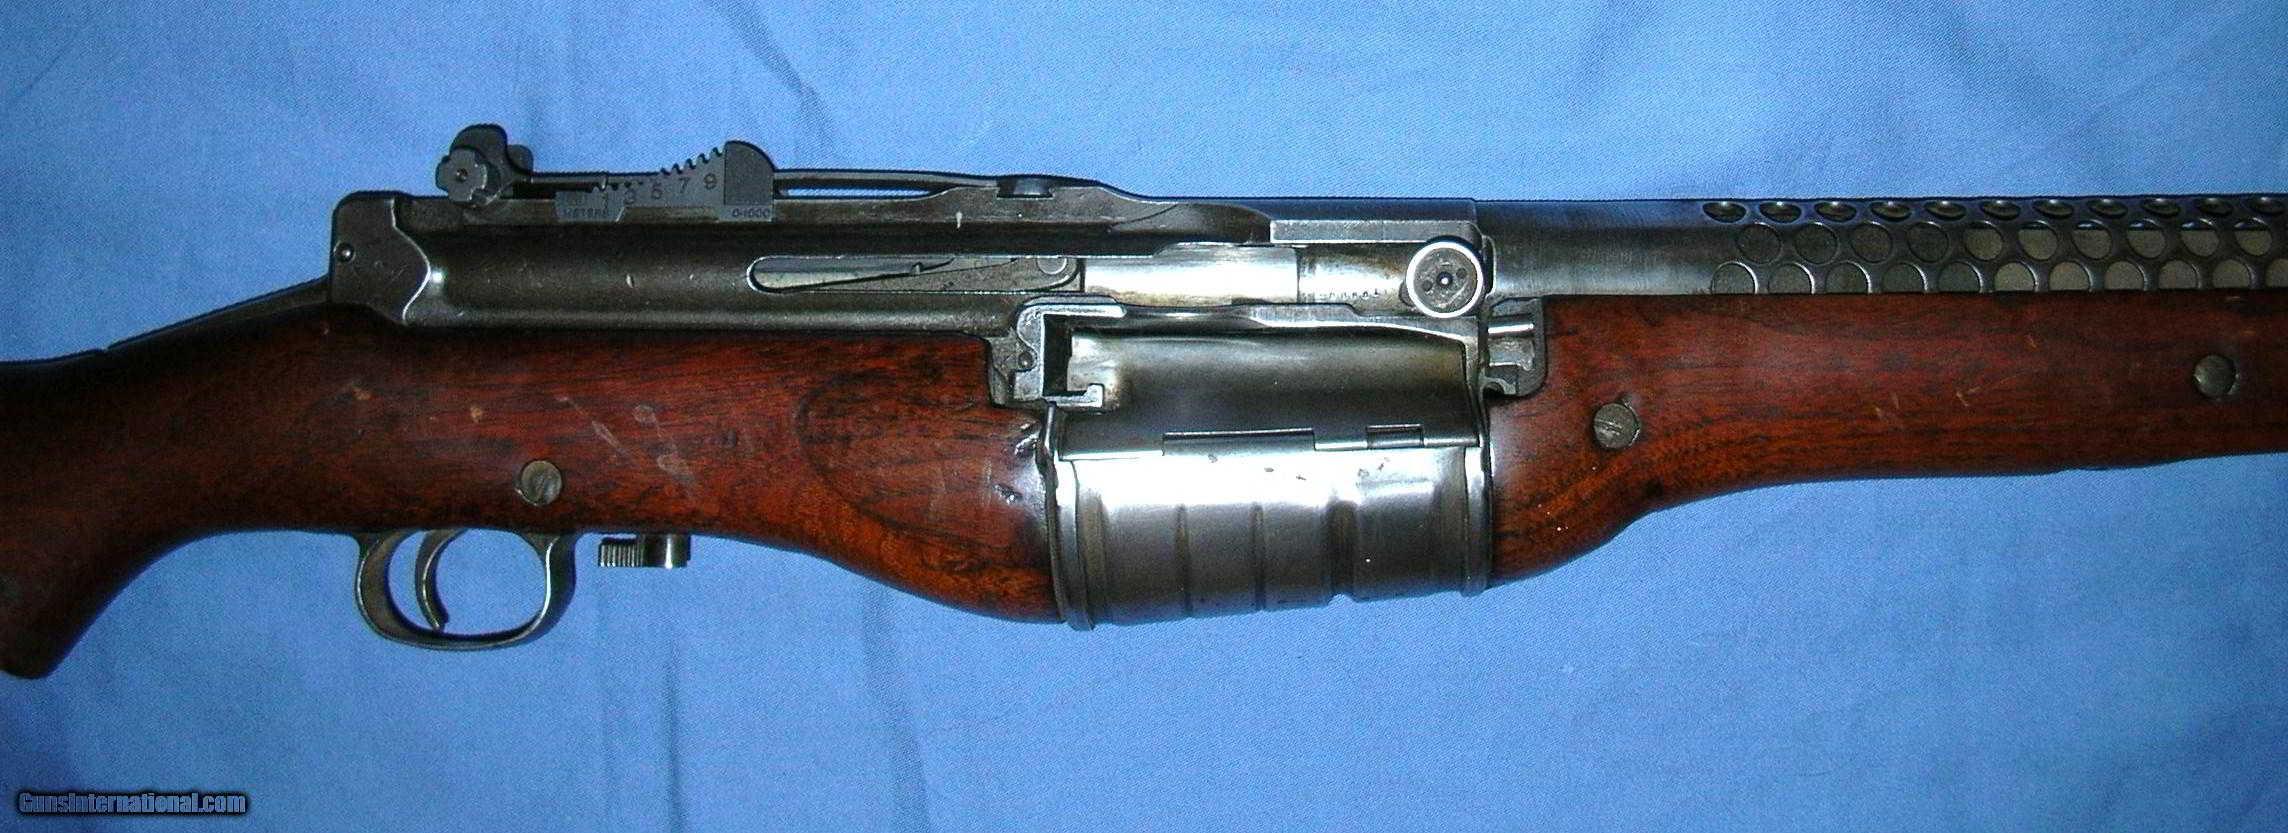 Johnson M.1941 rifle